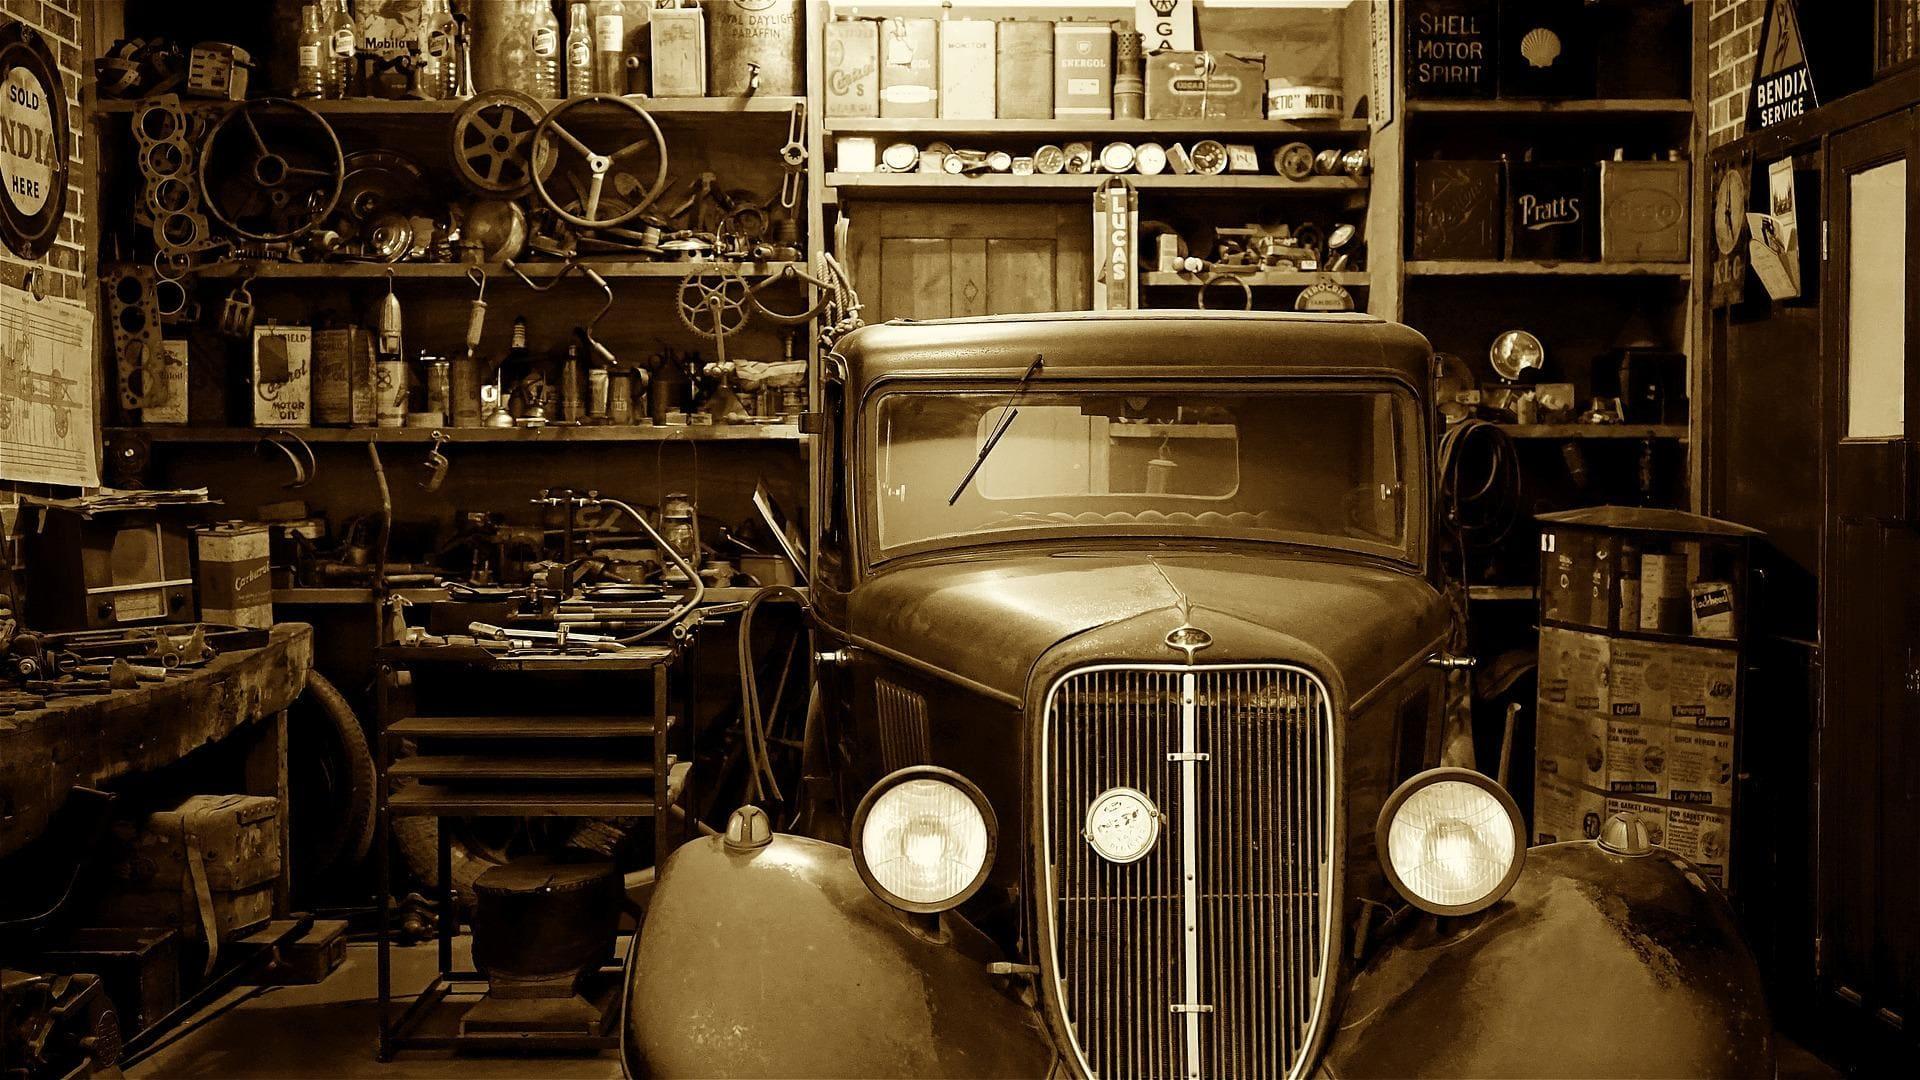 Finding a Trustworthy Auto Mechanics Near Me